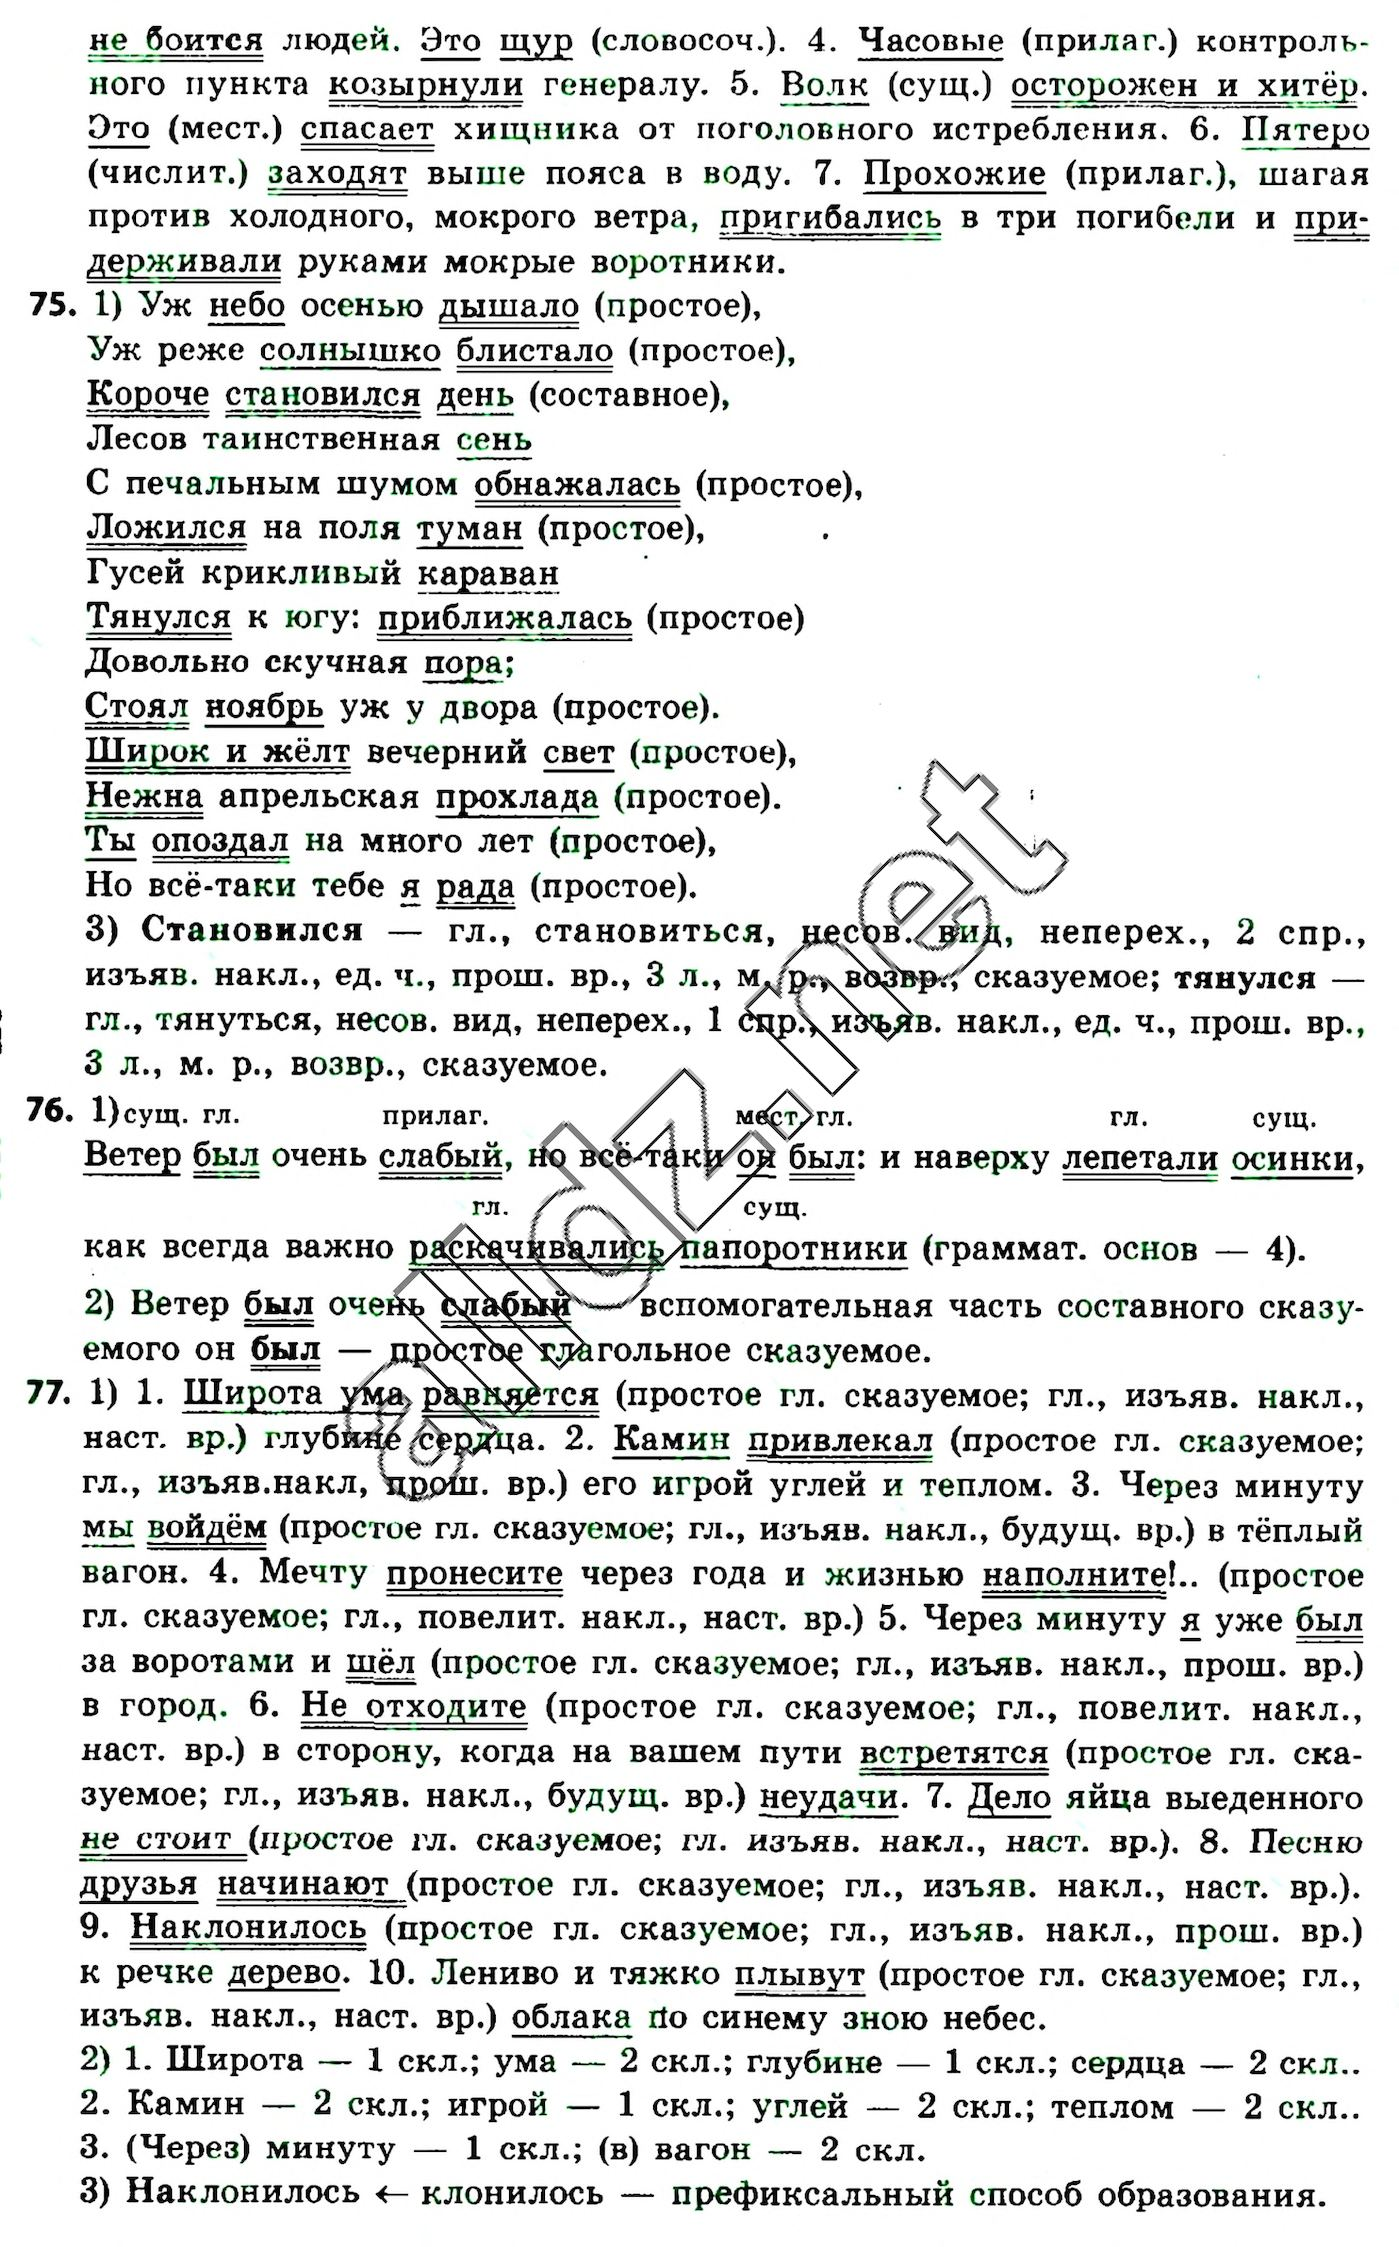 Гдз Для 8 Класса По Русскому Языку Быкова